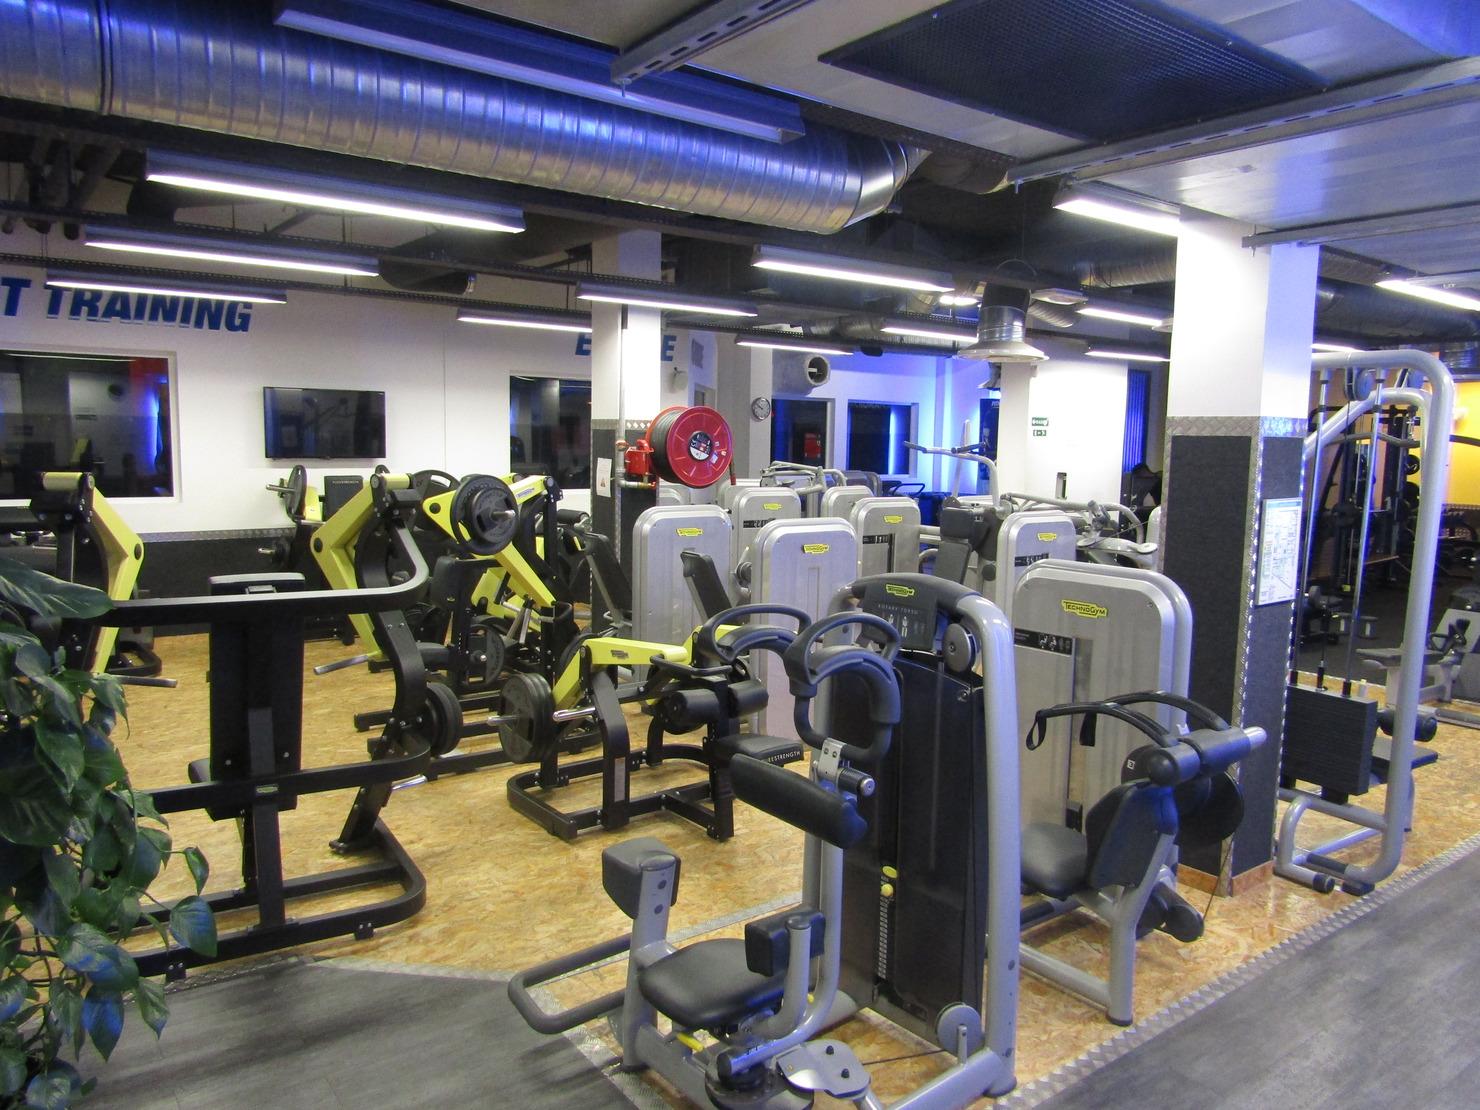 fitness park mulhouse tarifs avis horaires essai gratuit. Black Bedroom Furniture Sets. Home Design Ideas